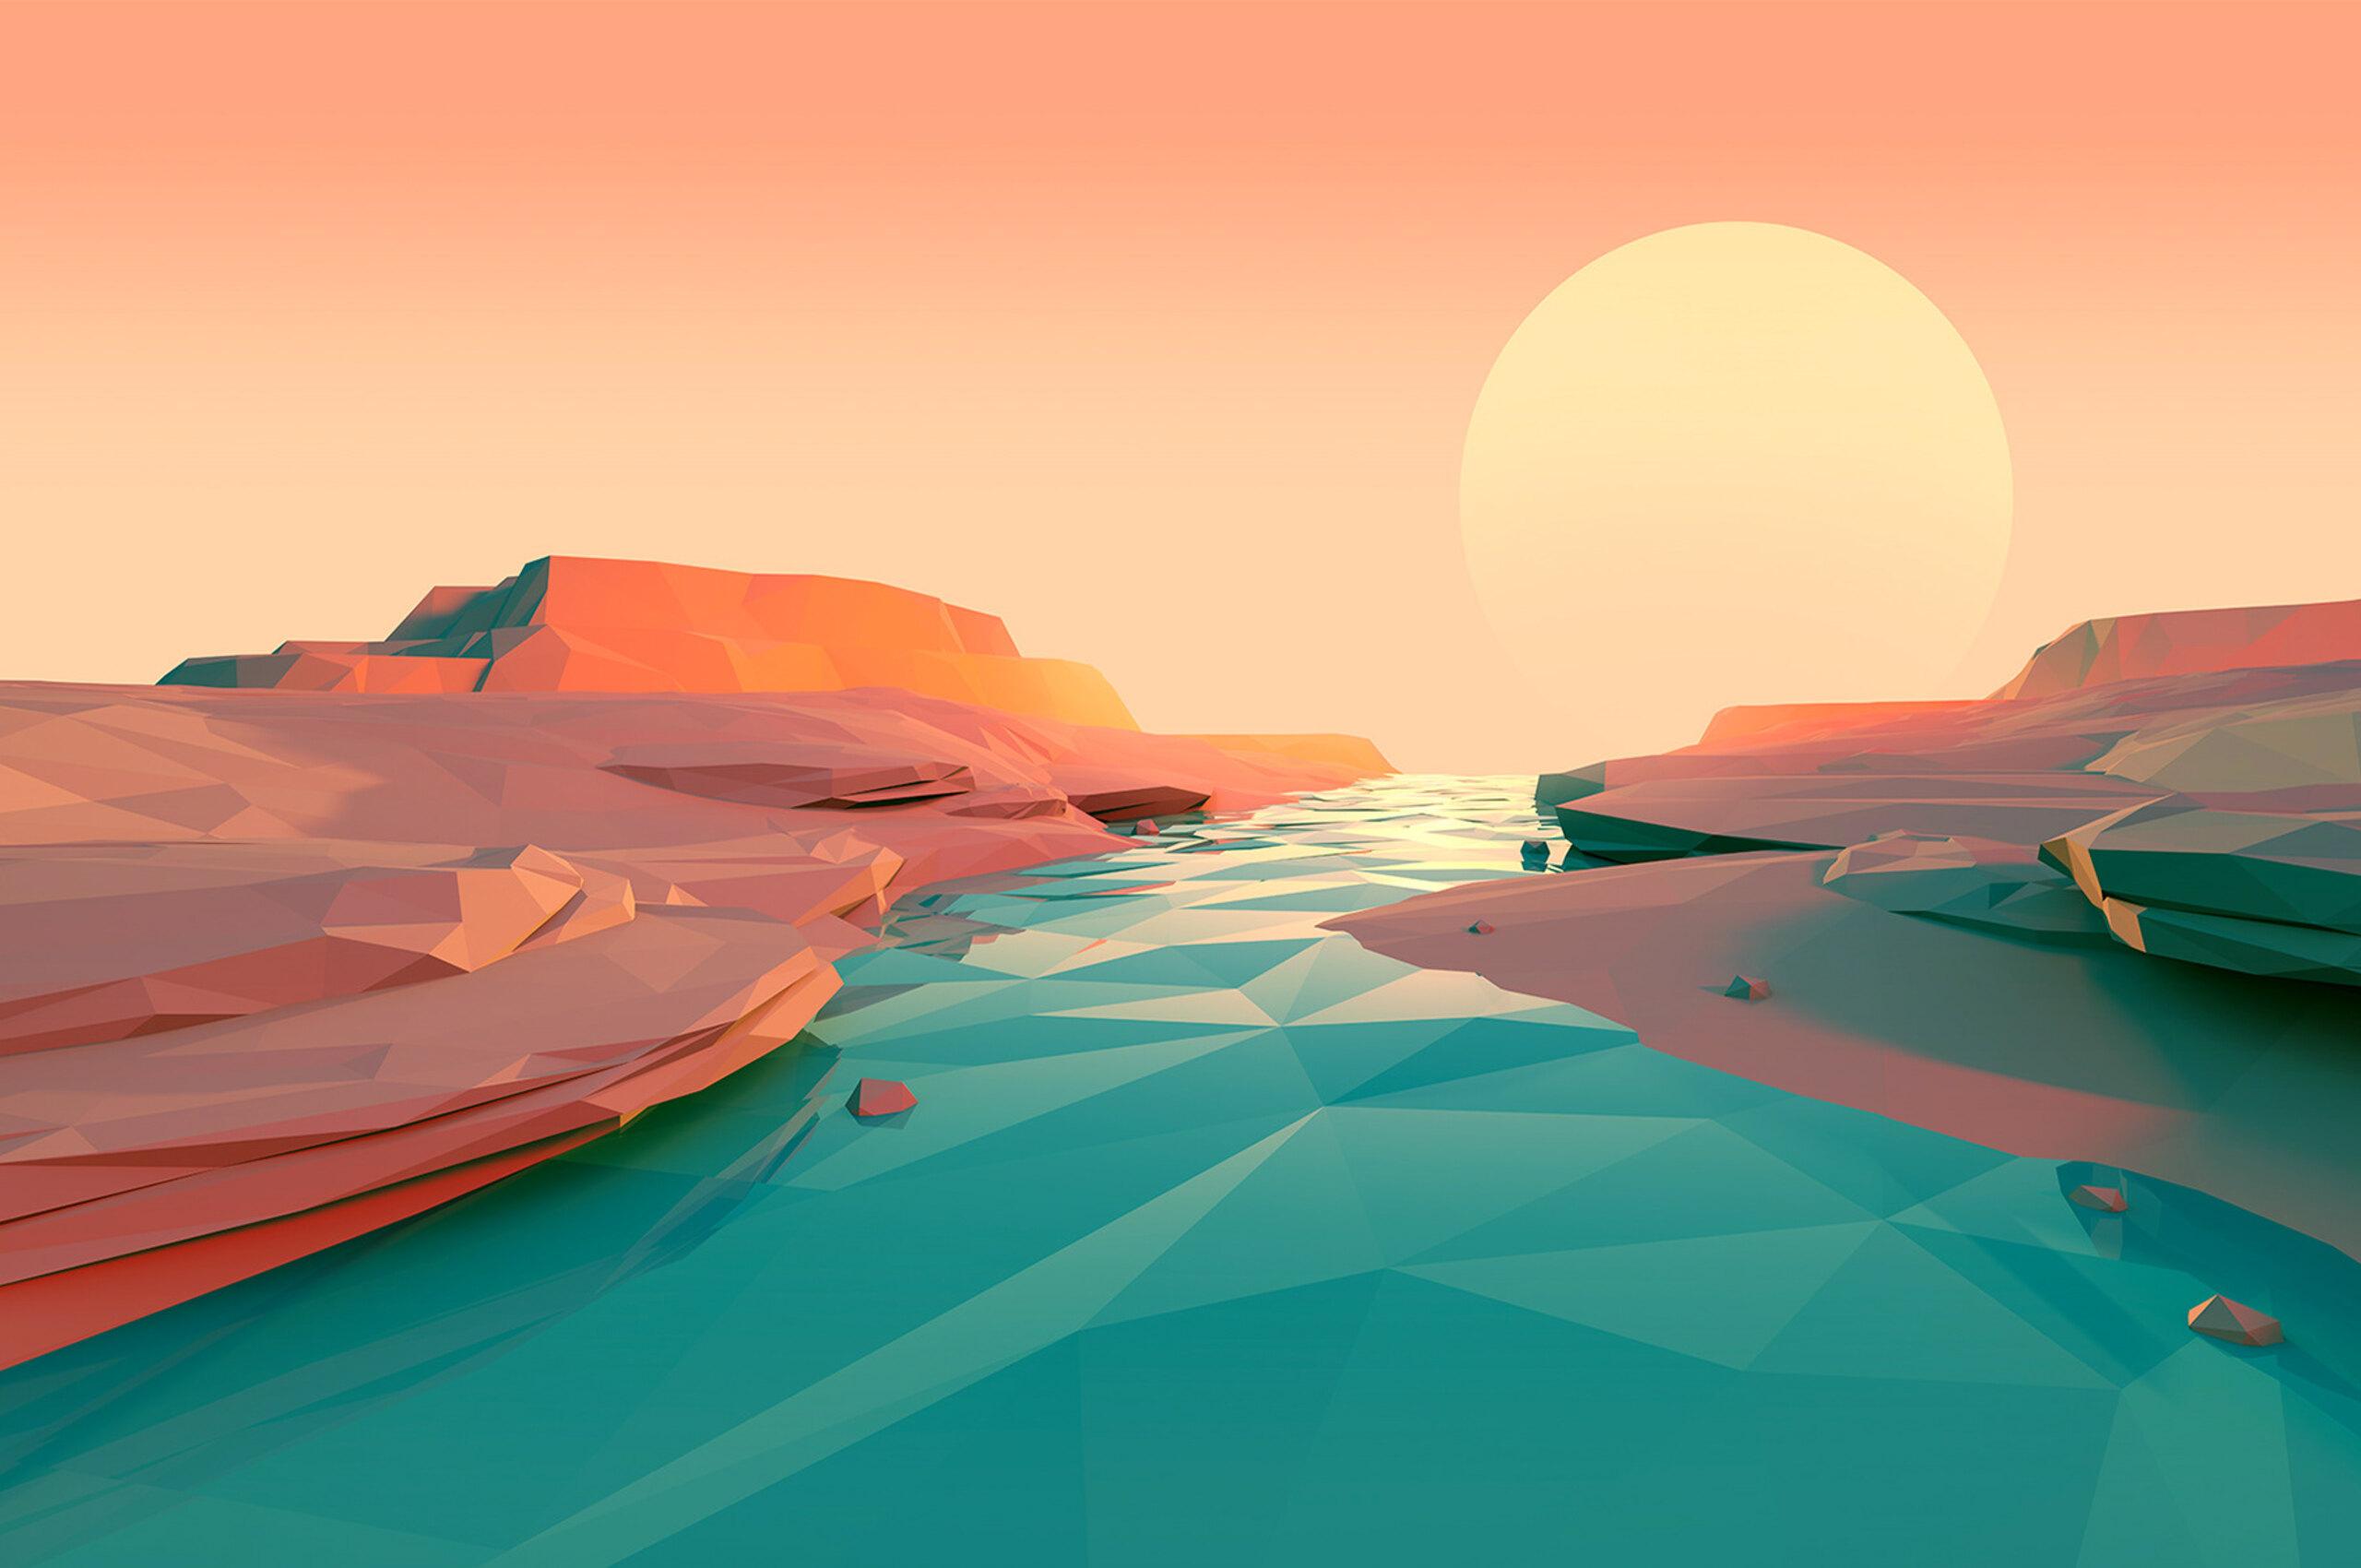 polygon-lake-sunset-minimalist-hl.jpg